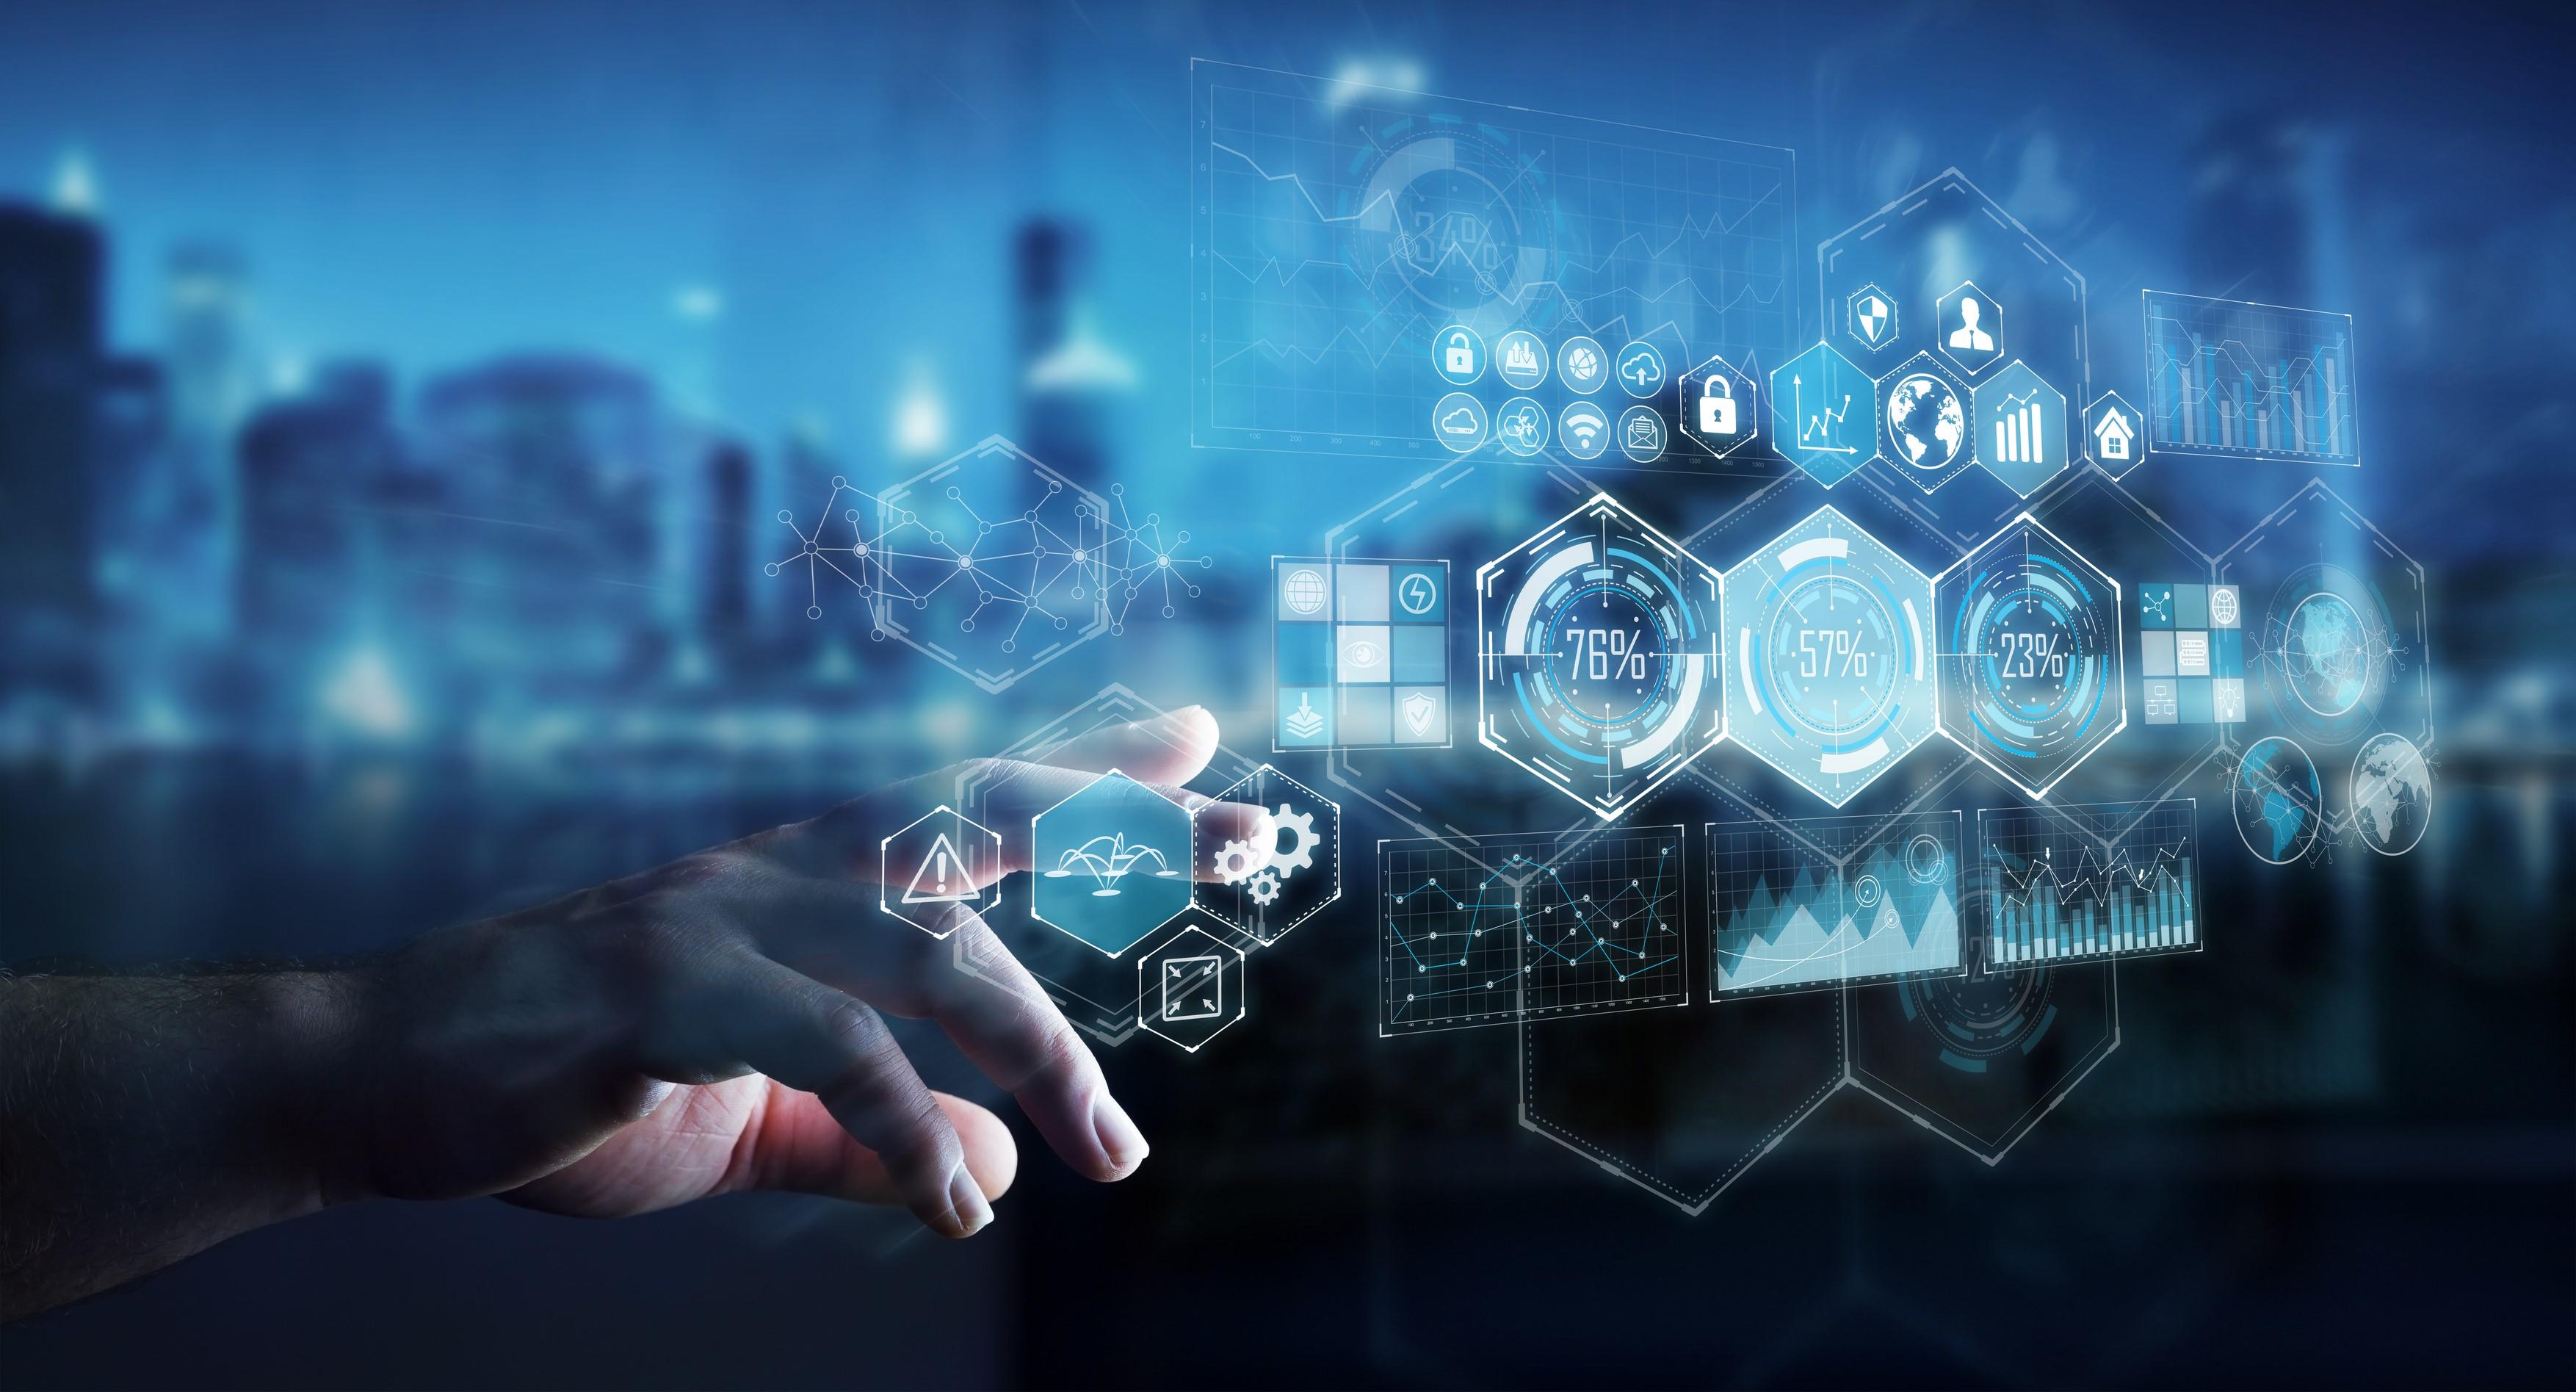 Bosch Connected World 2019